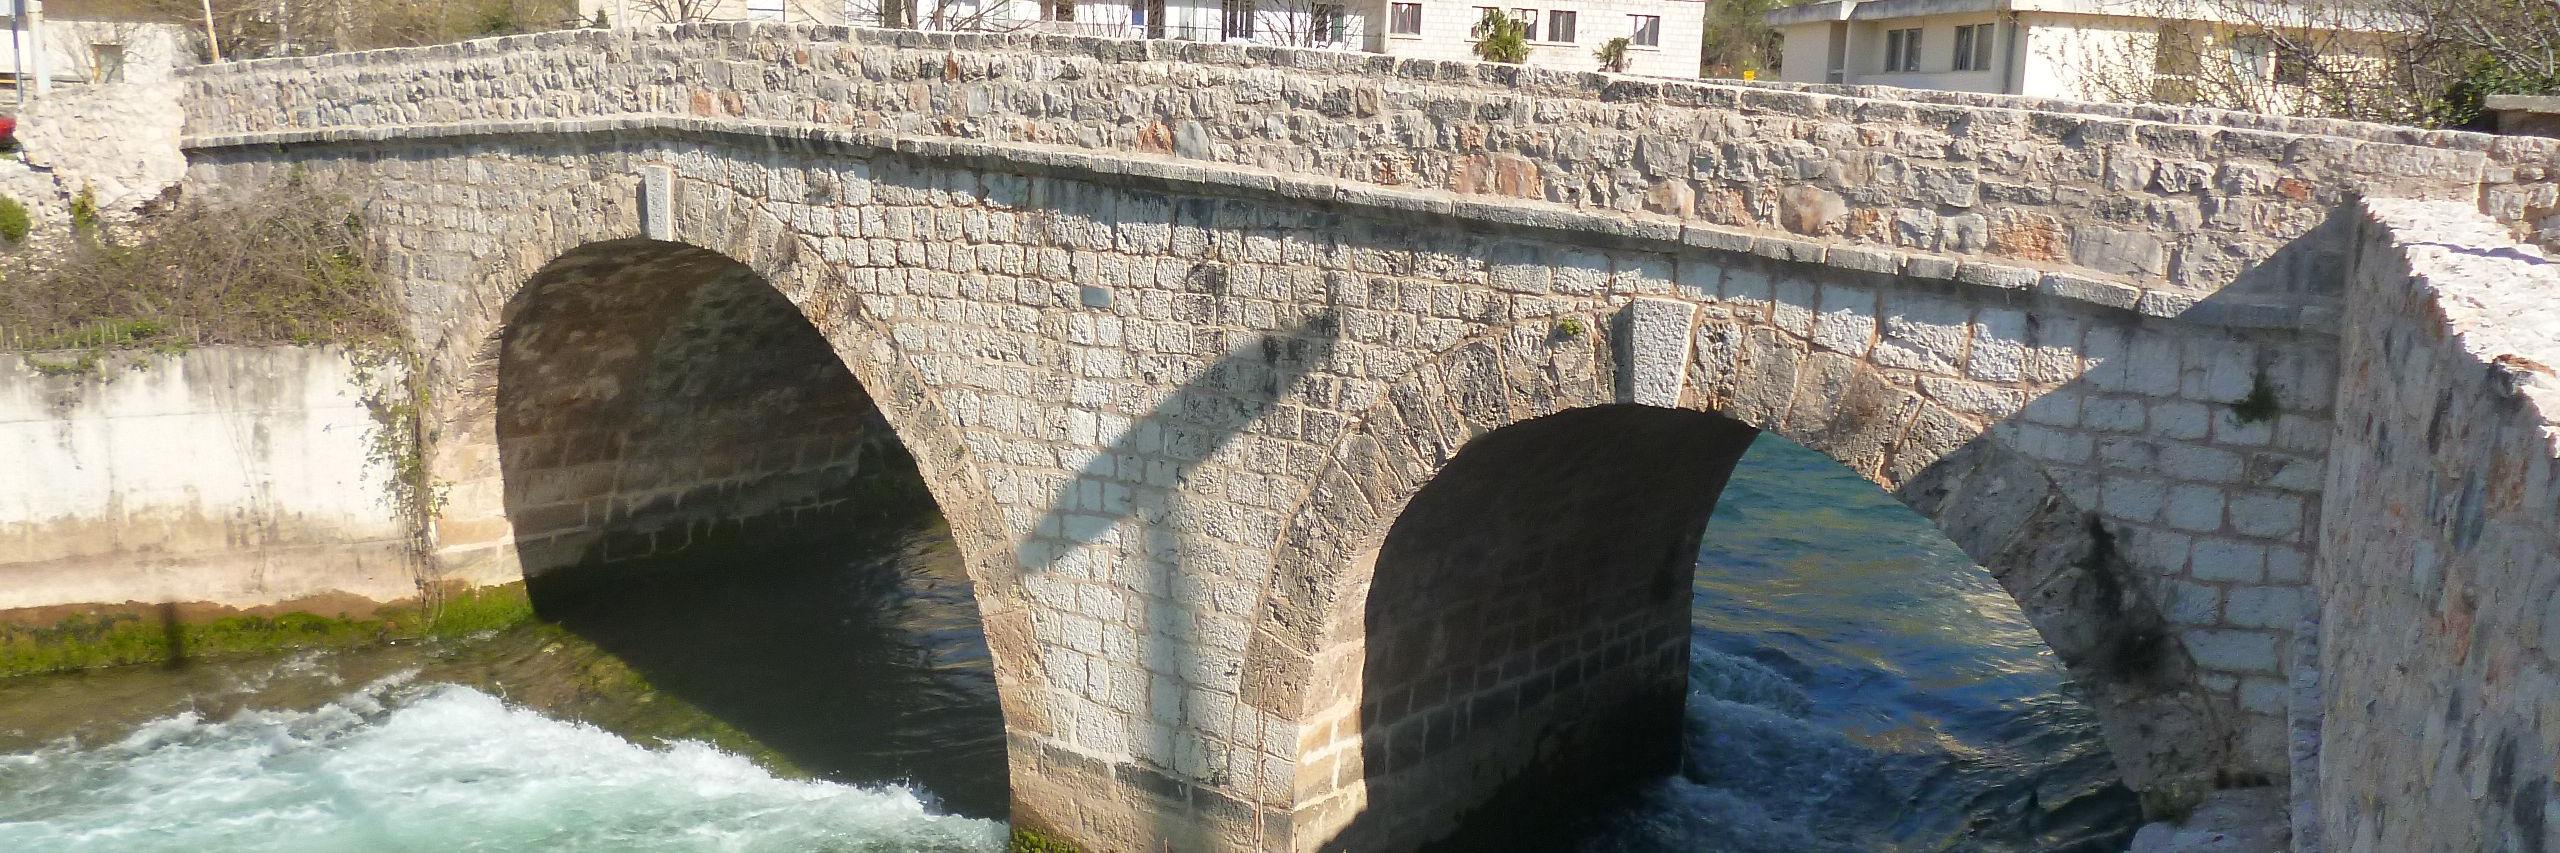 Подградский мост. Фото: Елена Арсениевич, CC BY-SA 3.0